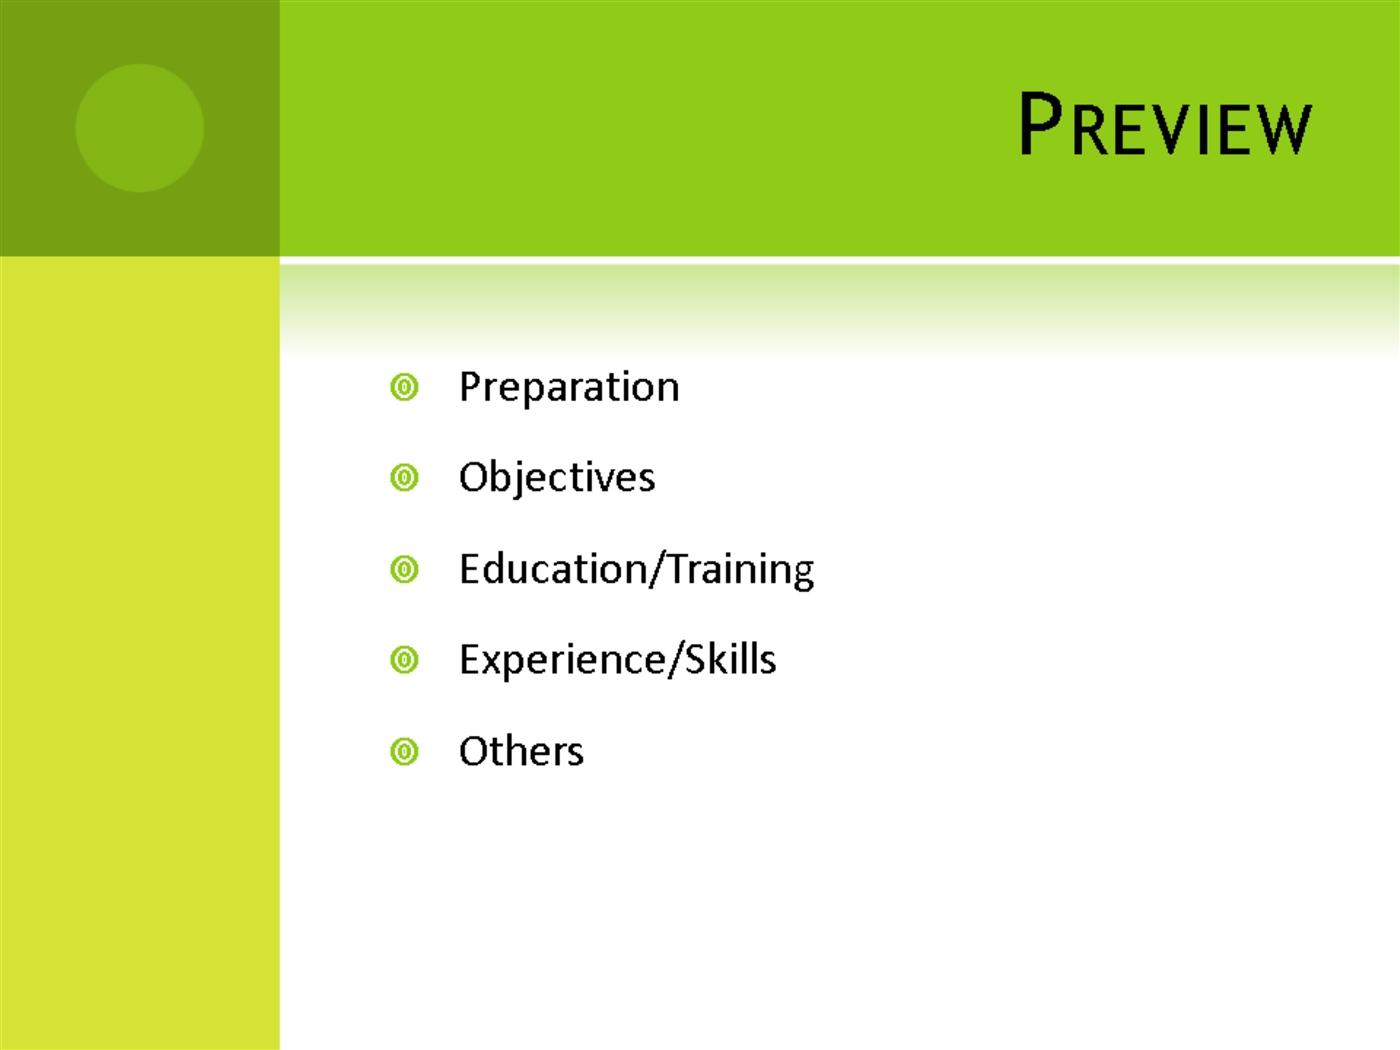 cv writing training ppt meganwest co slideplayer presentation format for ppt jan s illustrated computer literacy